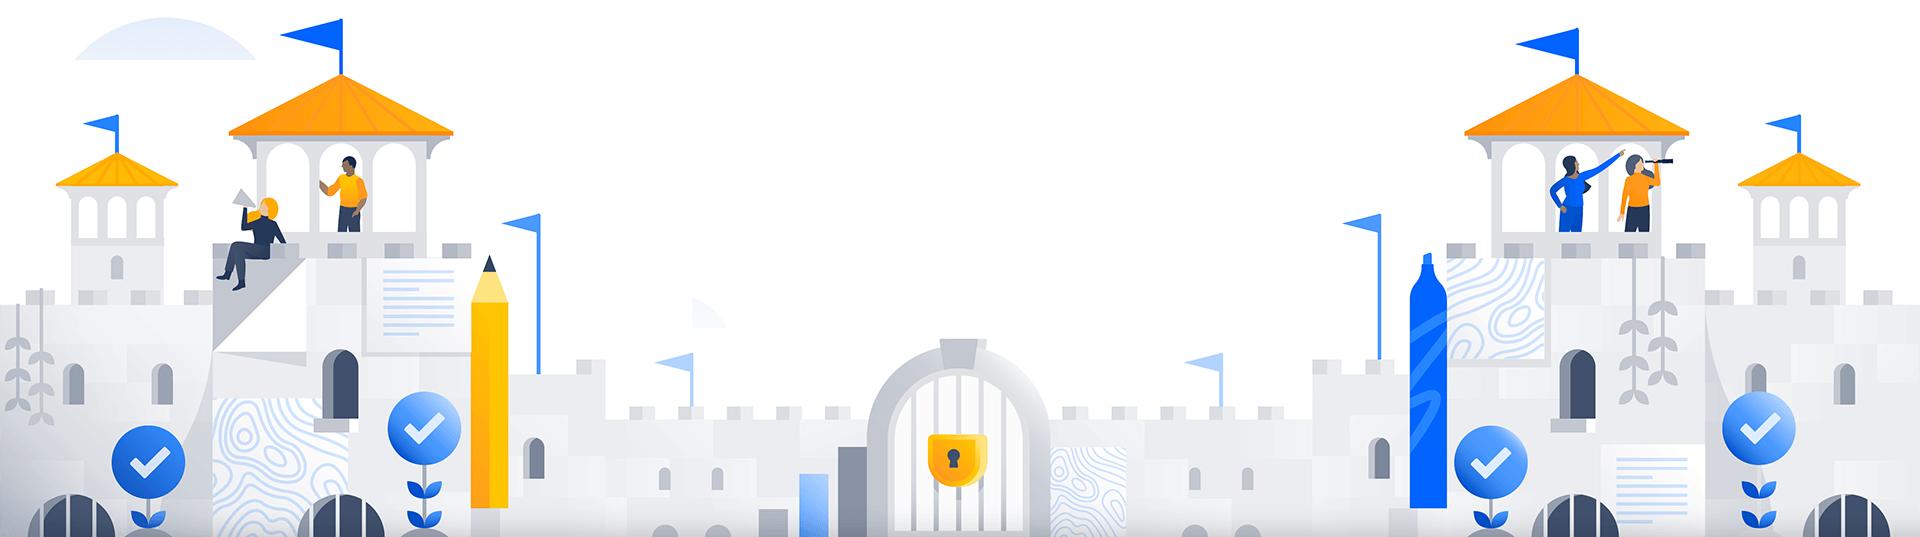 Atlassian background